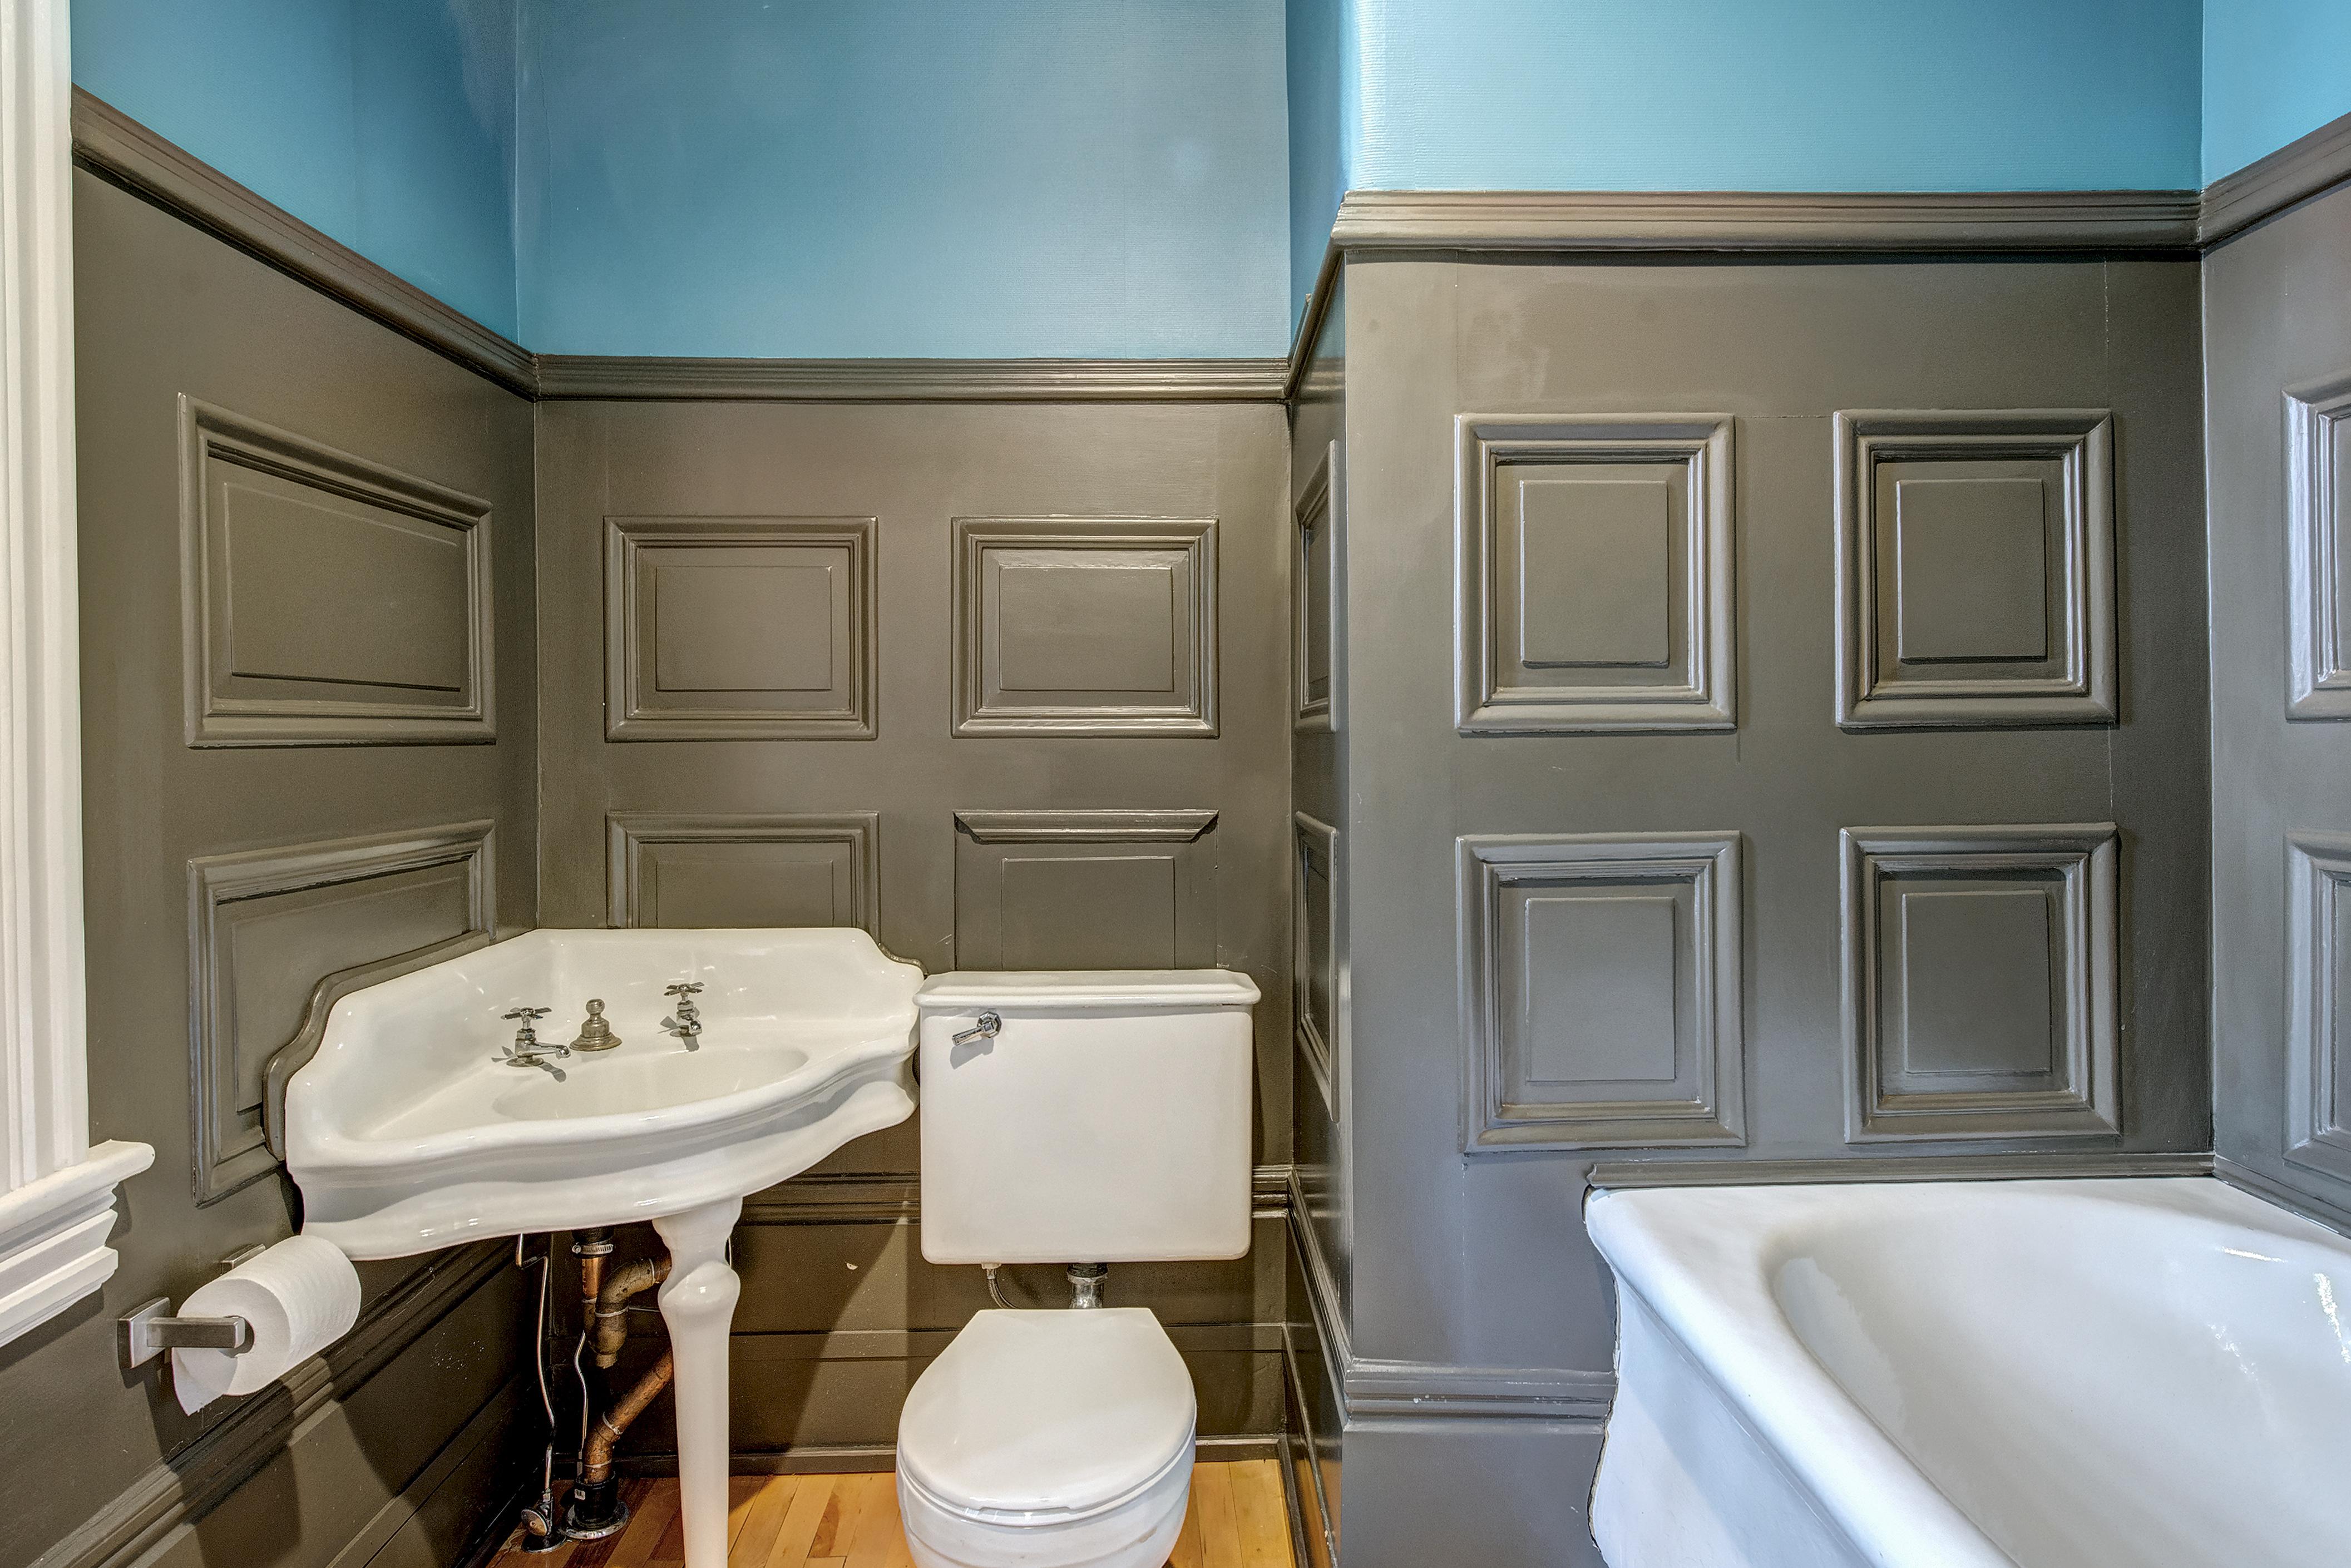 Image 3, Senator's Private Bathroom adjoining the Sitting Room.